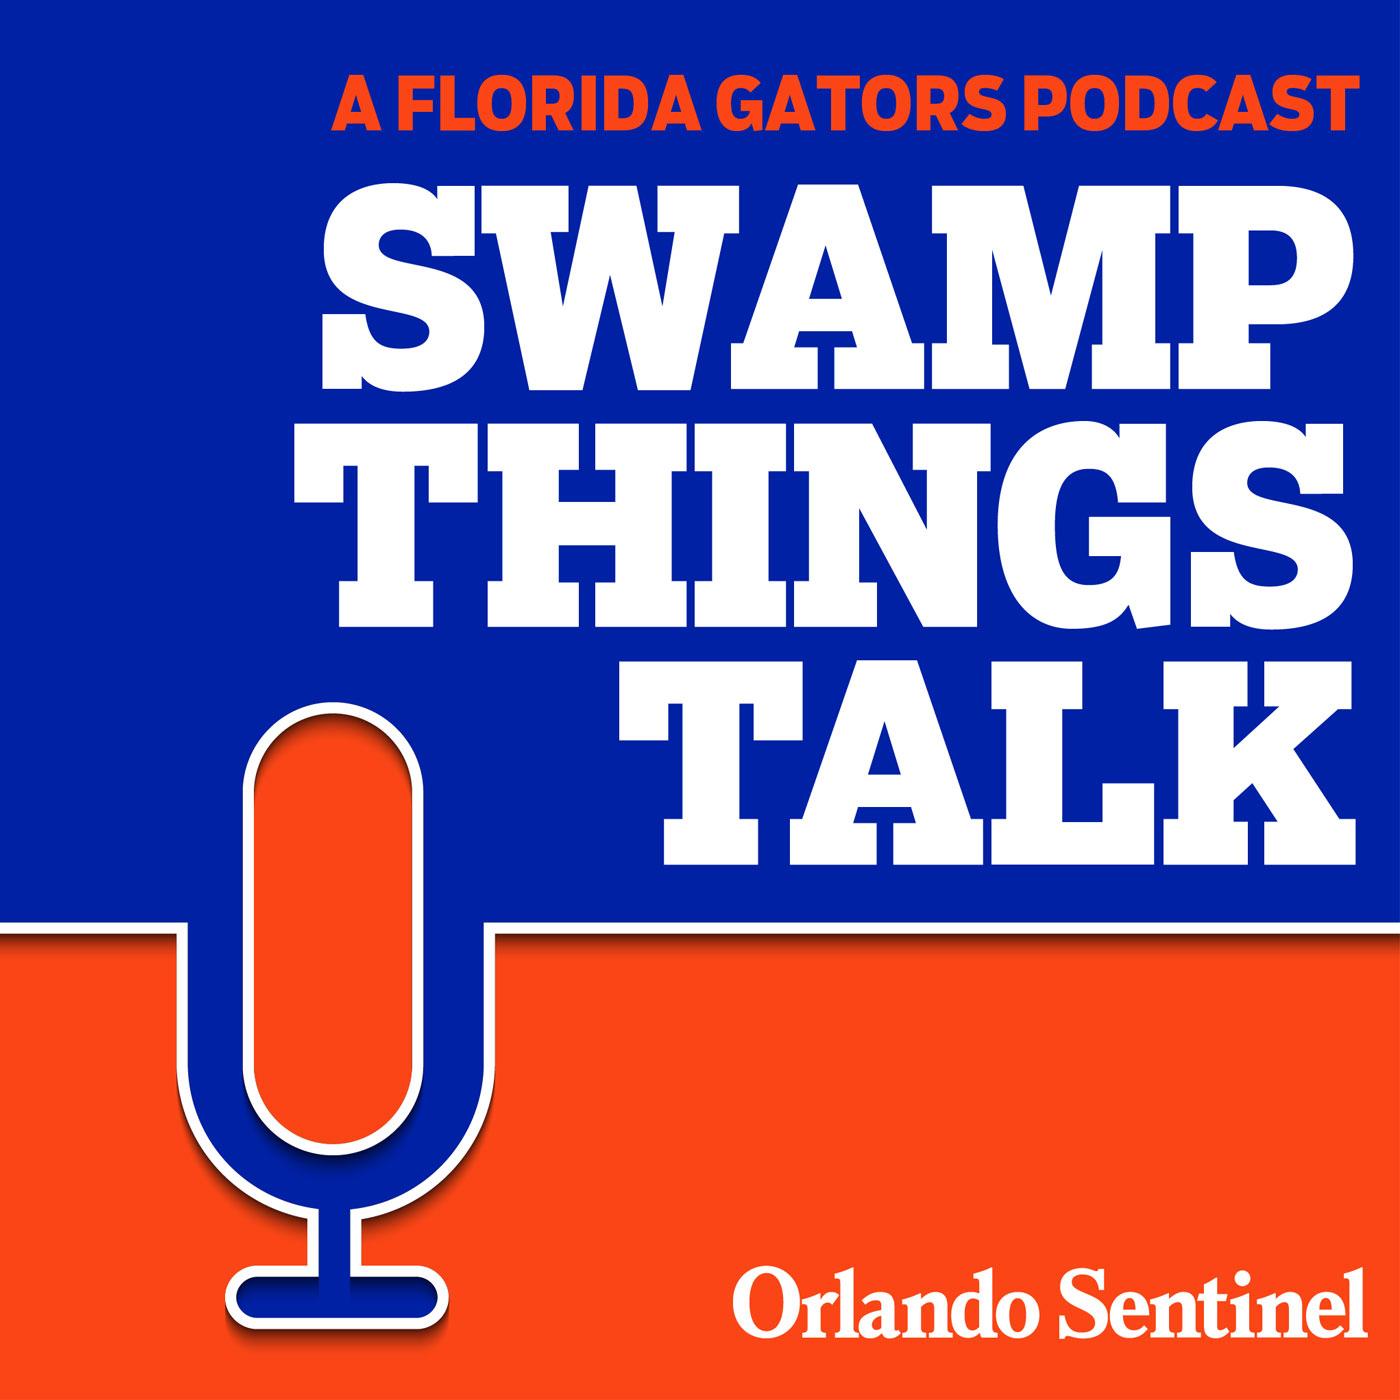 Swamp Things: Florida Gators Show show art